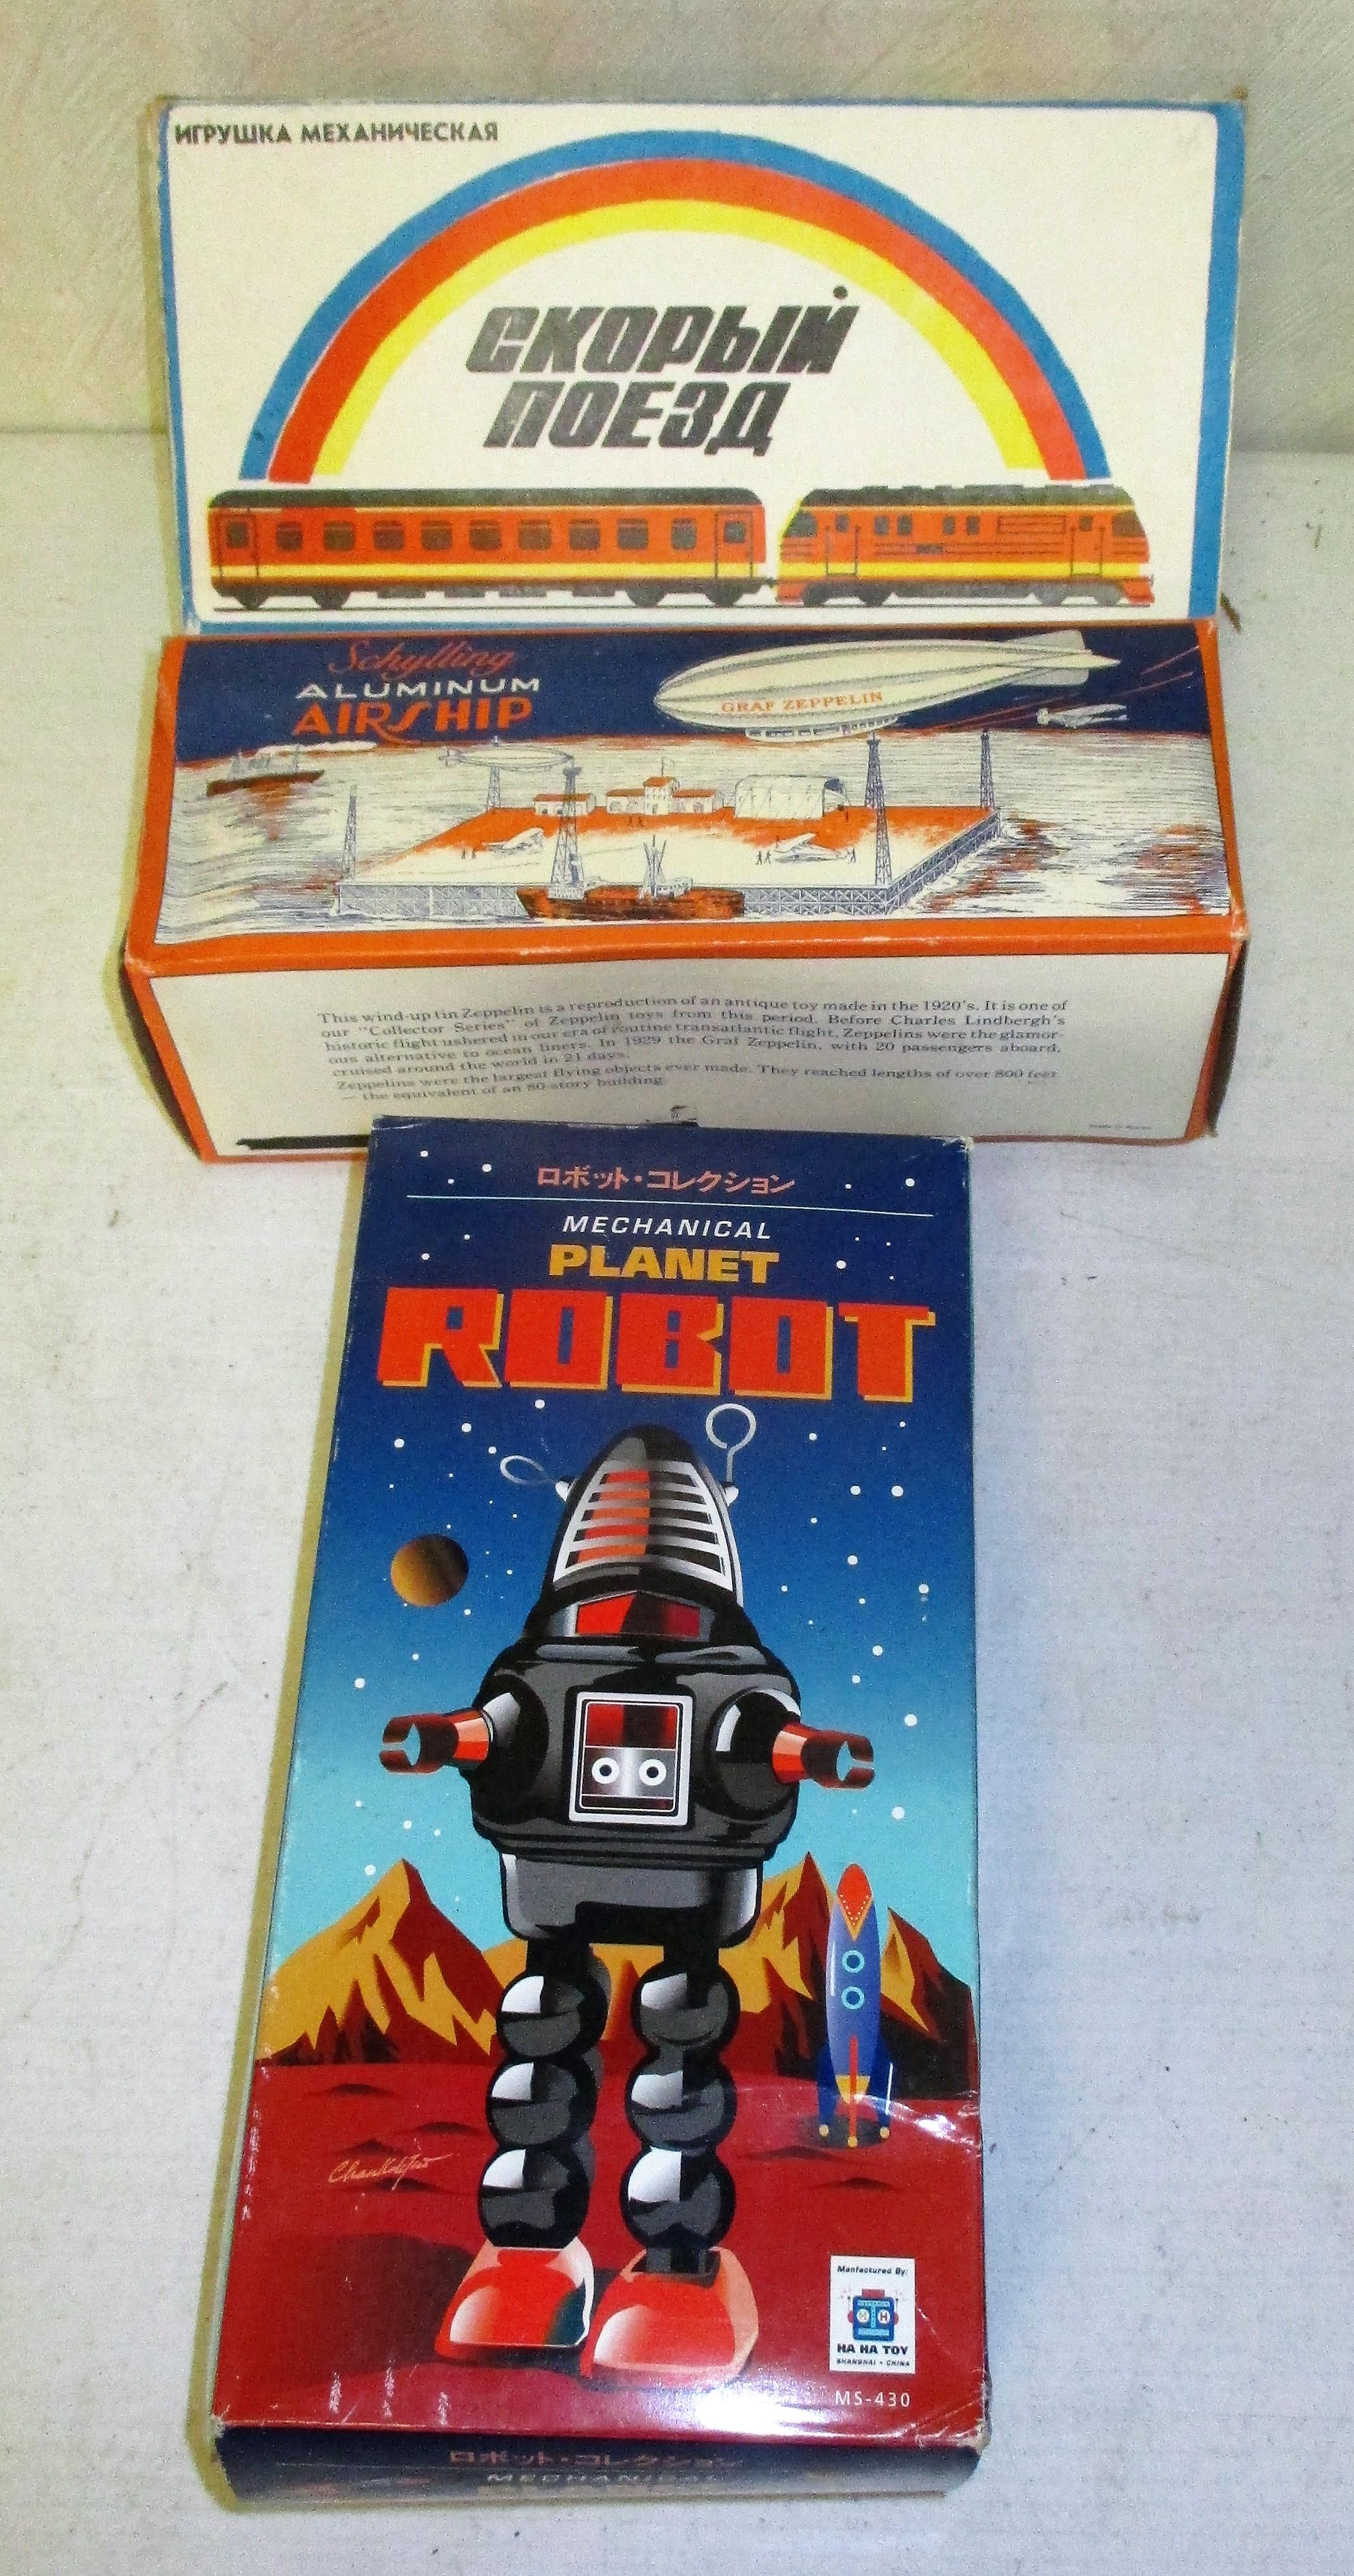 195: Train, Zepplin And Robot Toys